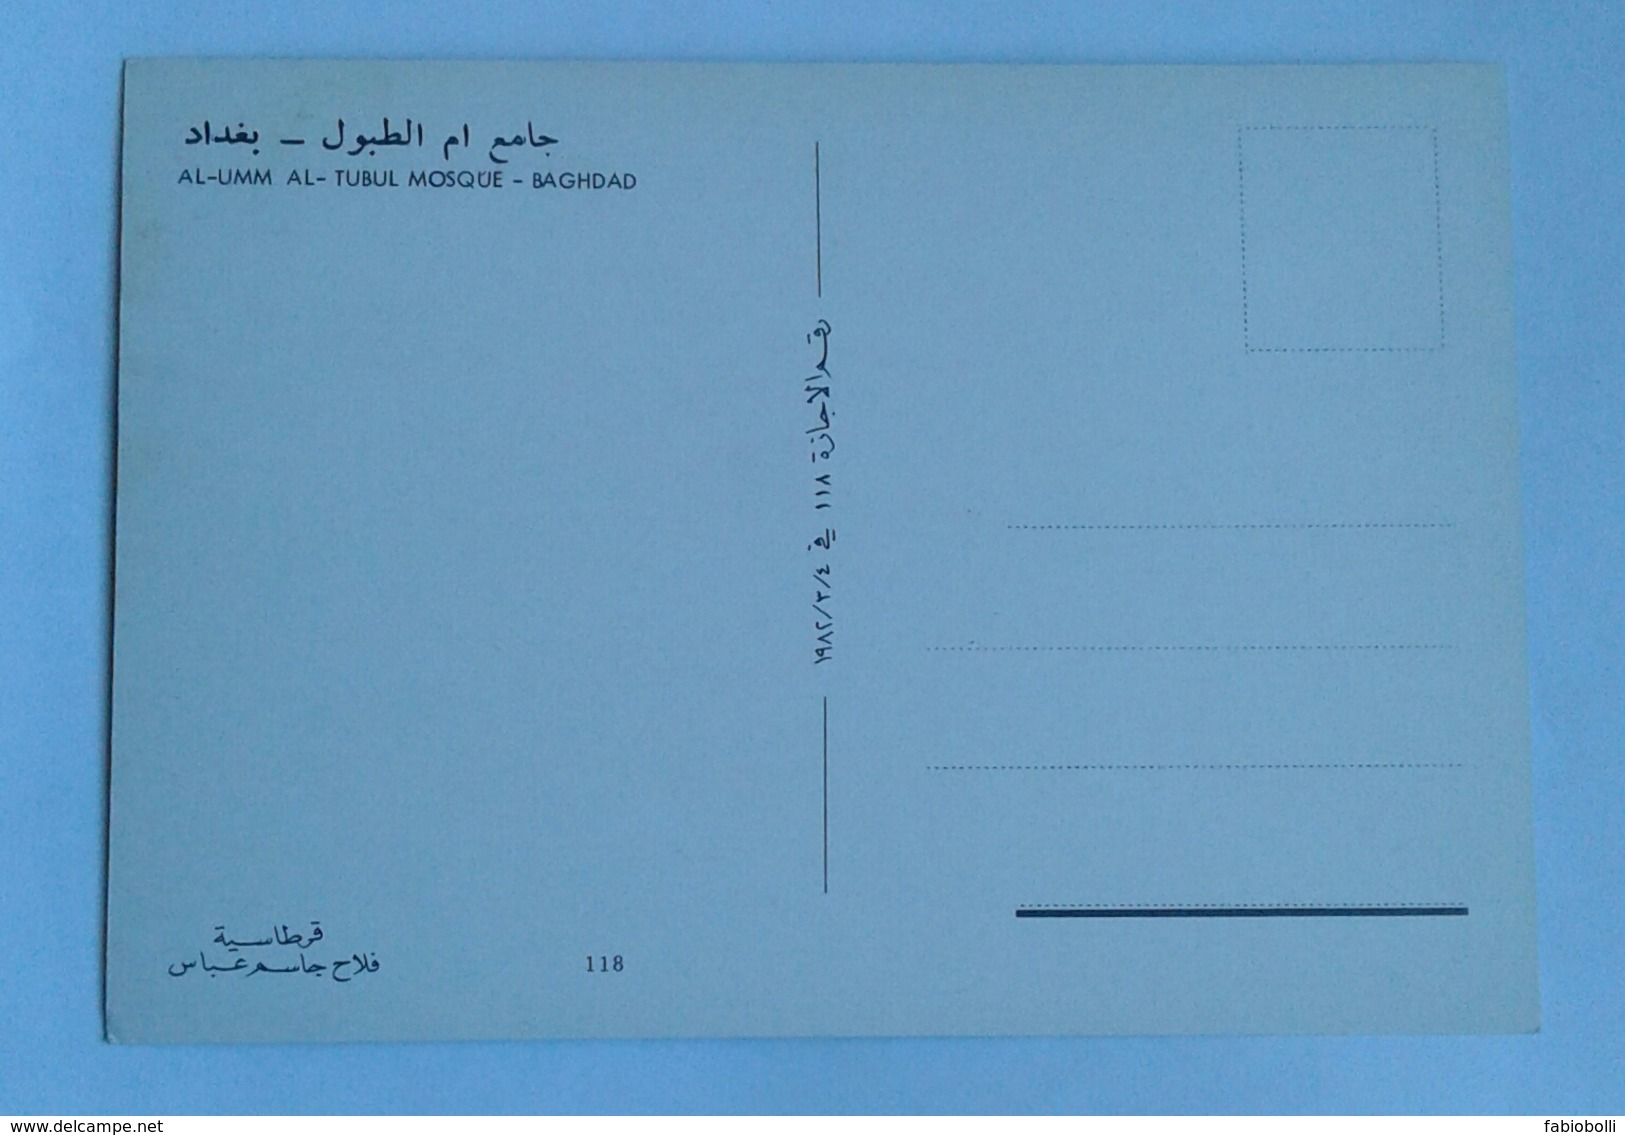 BAGHDAD - MOSCHEA AL-UMM AL-TUBUL (6381) - Iraq